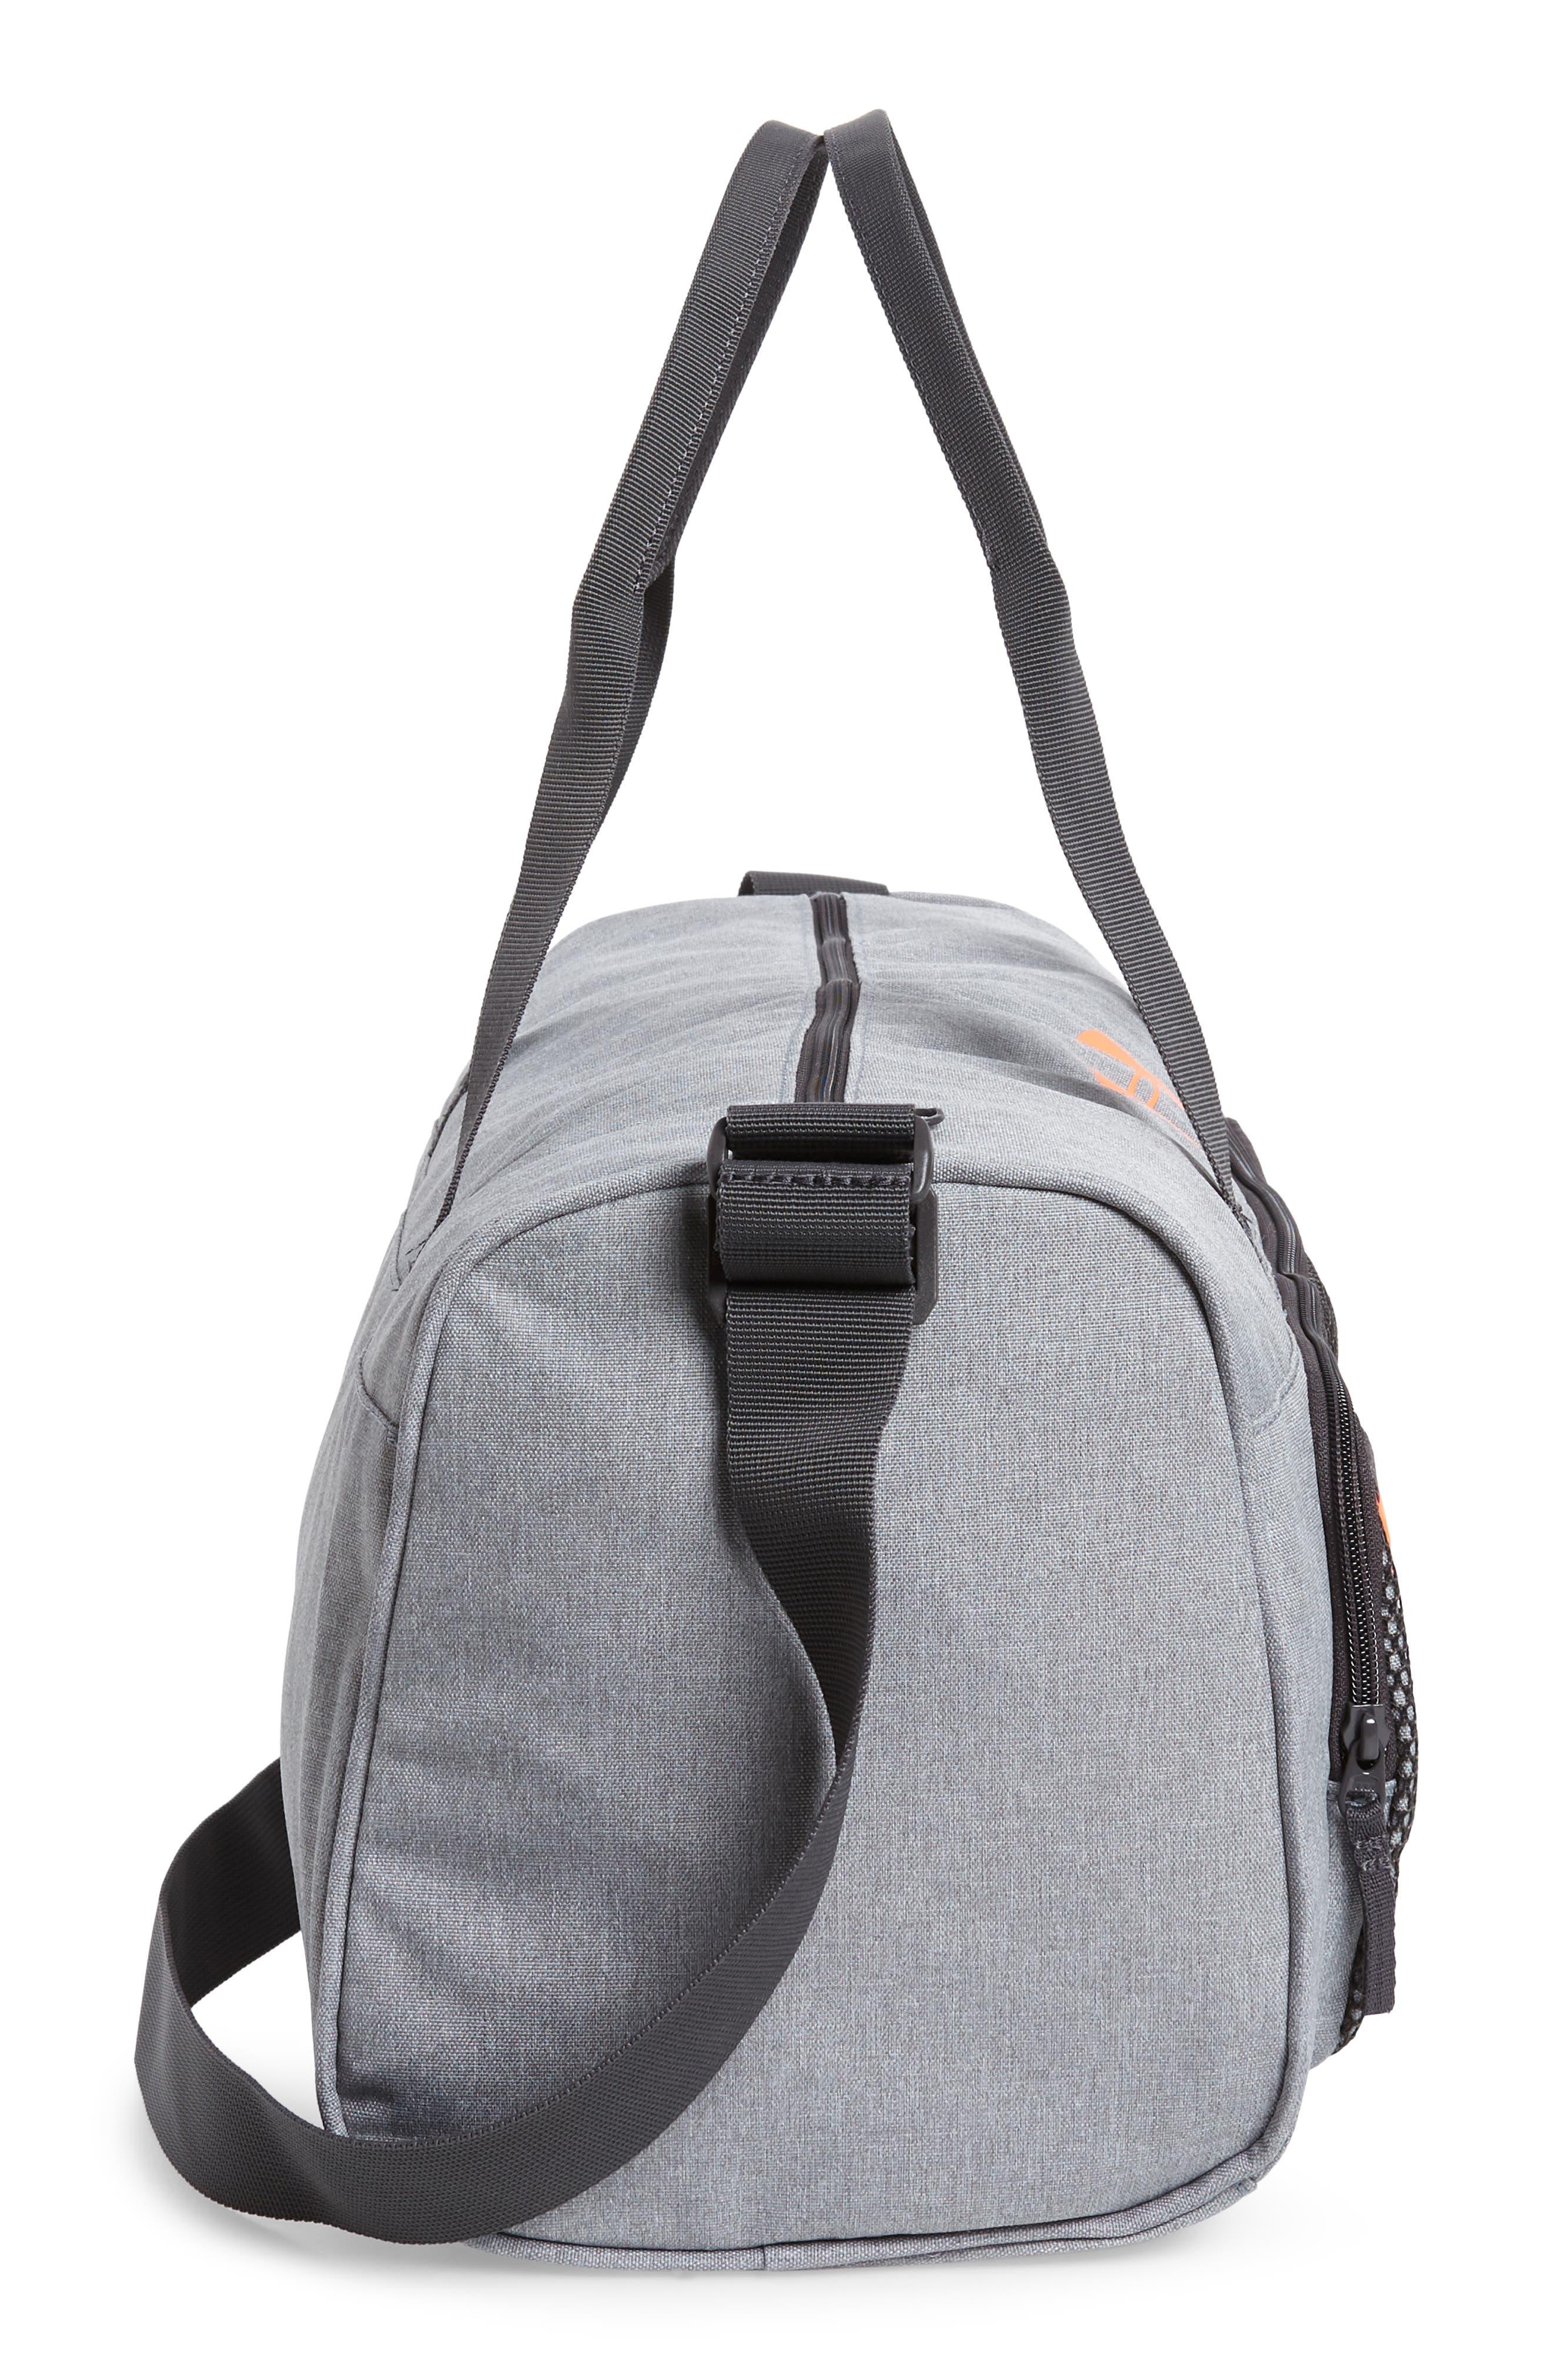 Select Water Resistant Duffel Bag,                             Alternate thumbnail 4, color,                             STEEL HEATHER /CHARCOAL/ORANGE